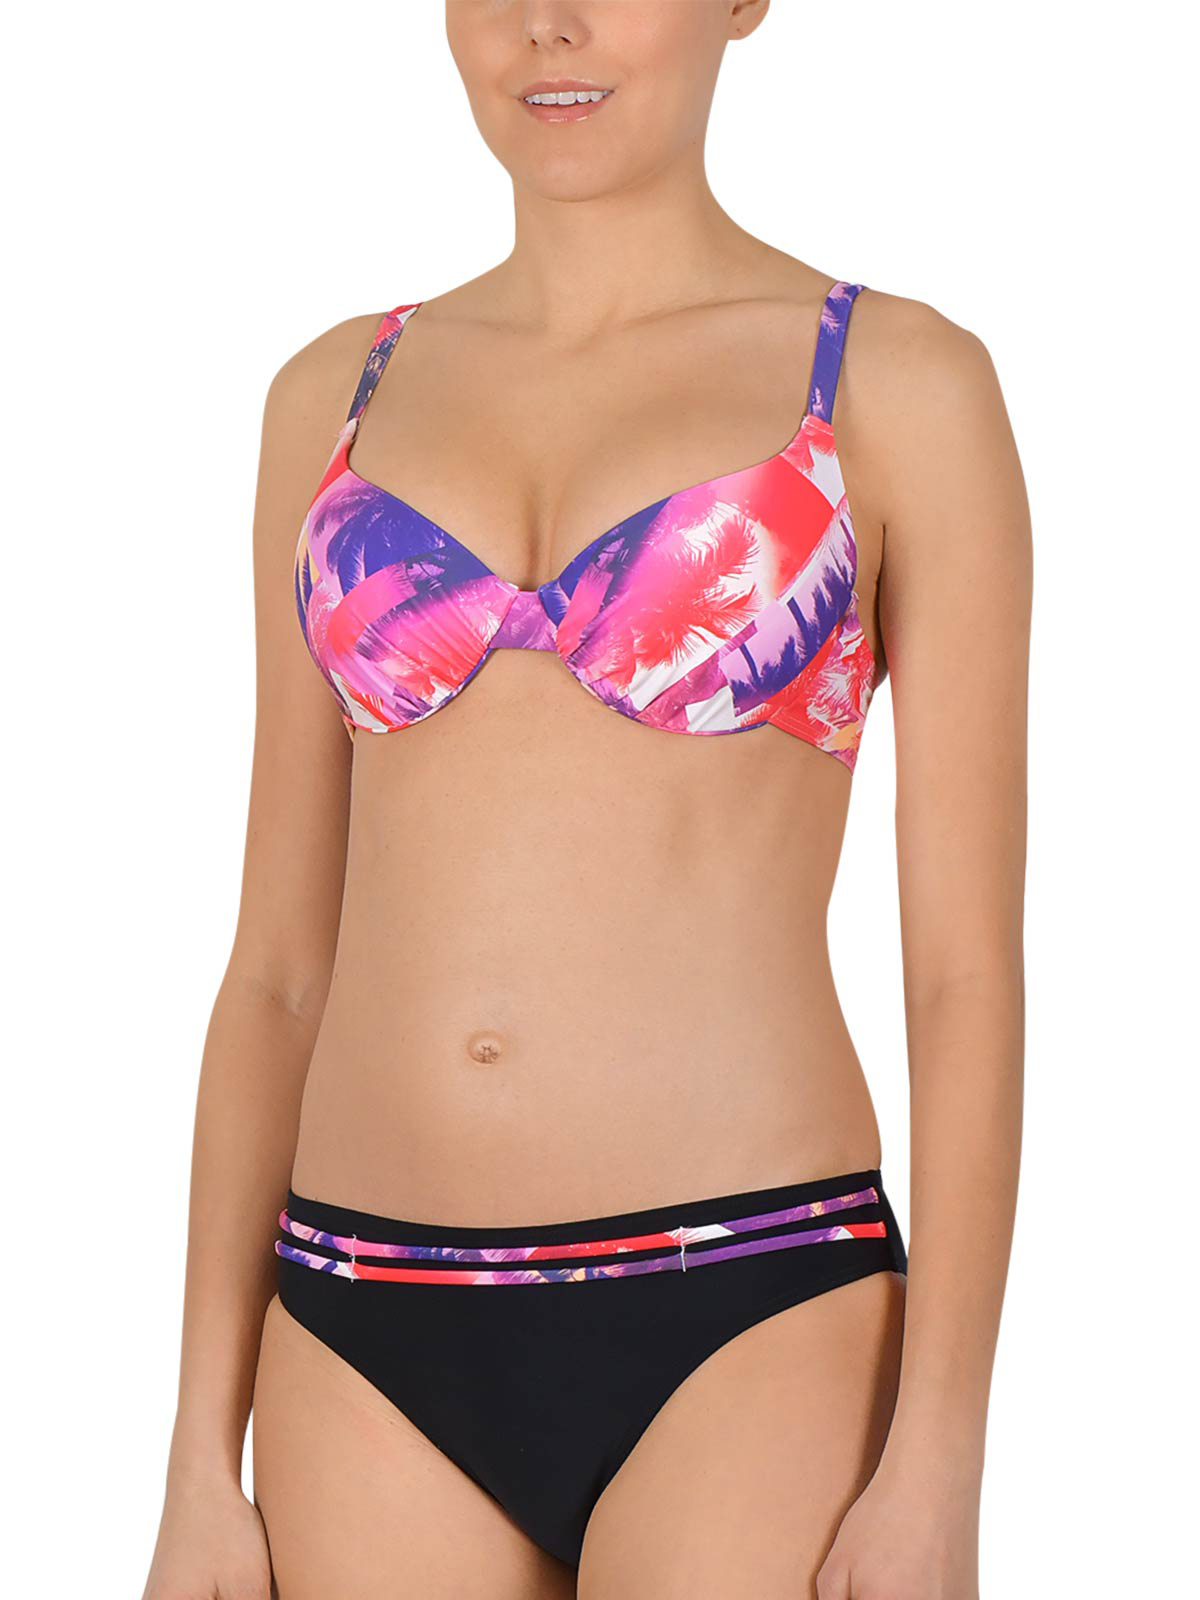 NATURANA Schalen Bikini mit Bügel 72504 Gr. 36-44 B-D